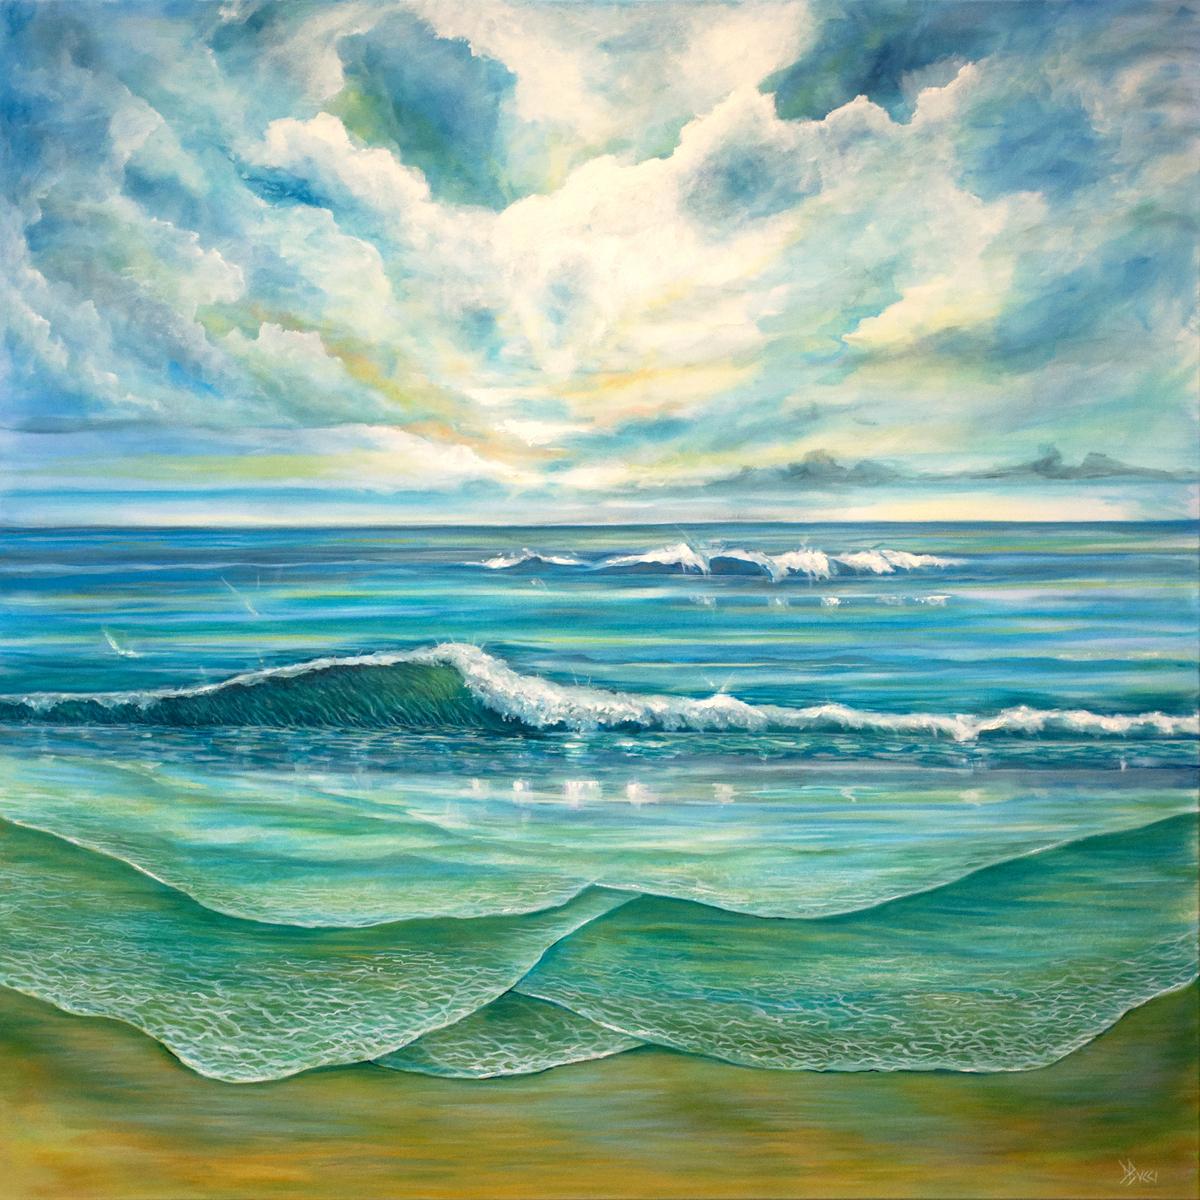 Waves of Renewal (large view)